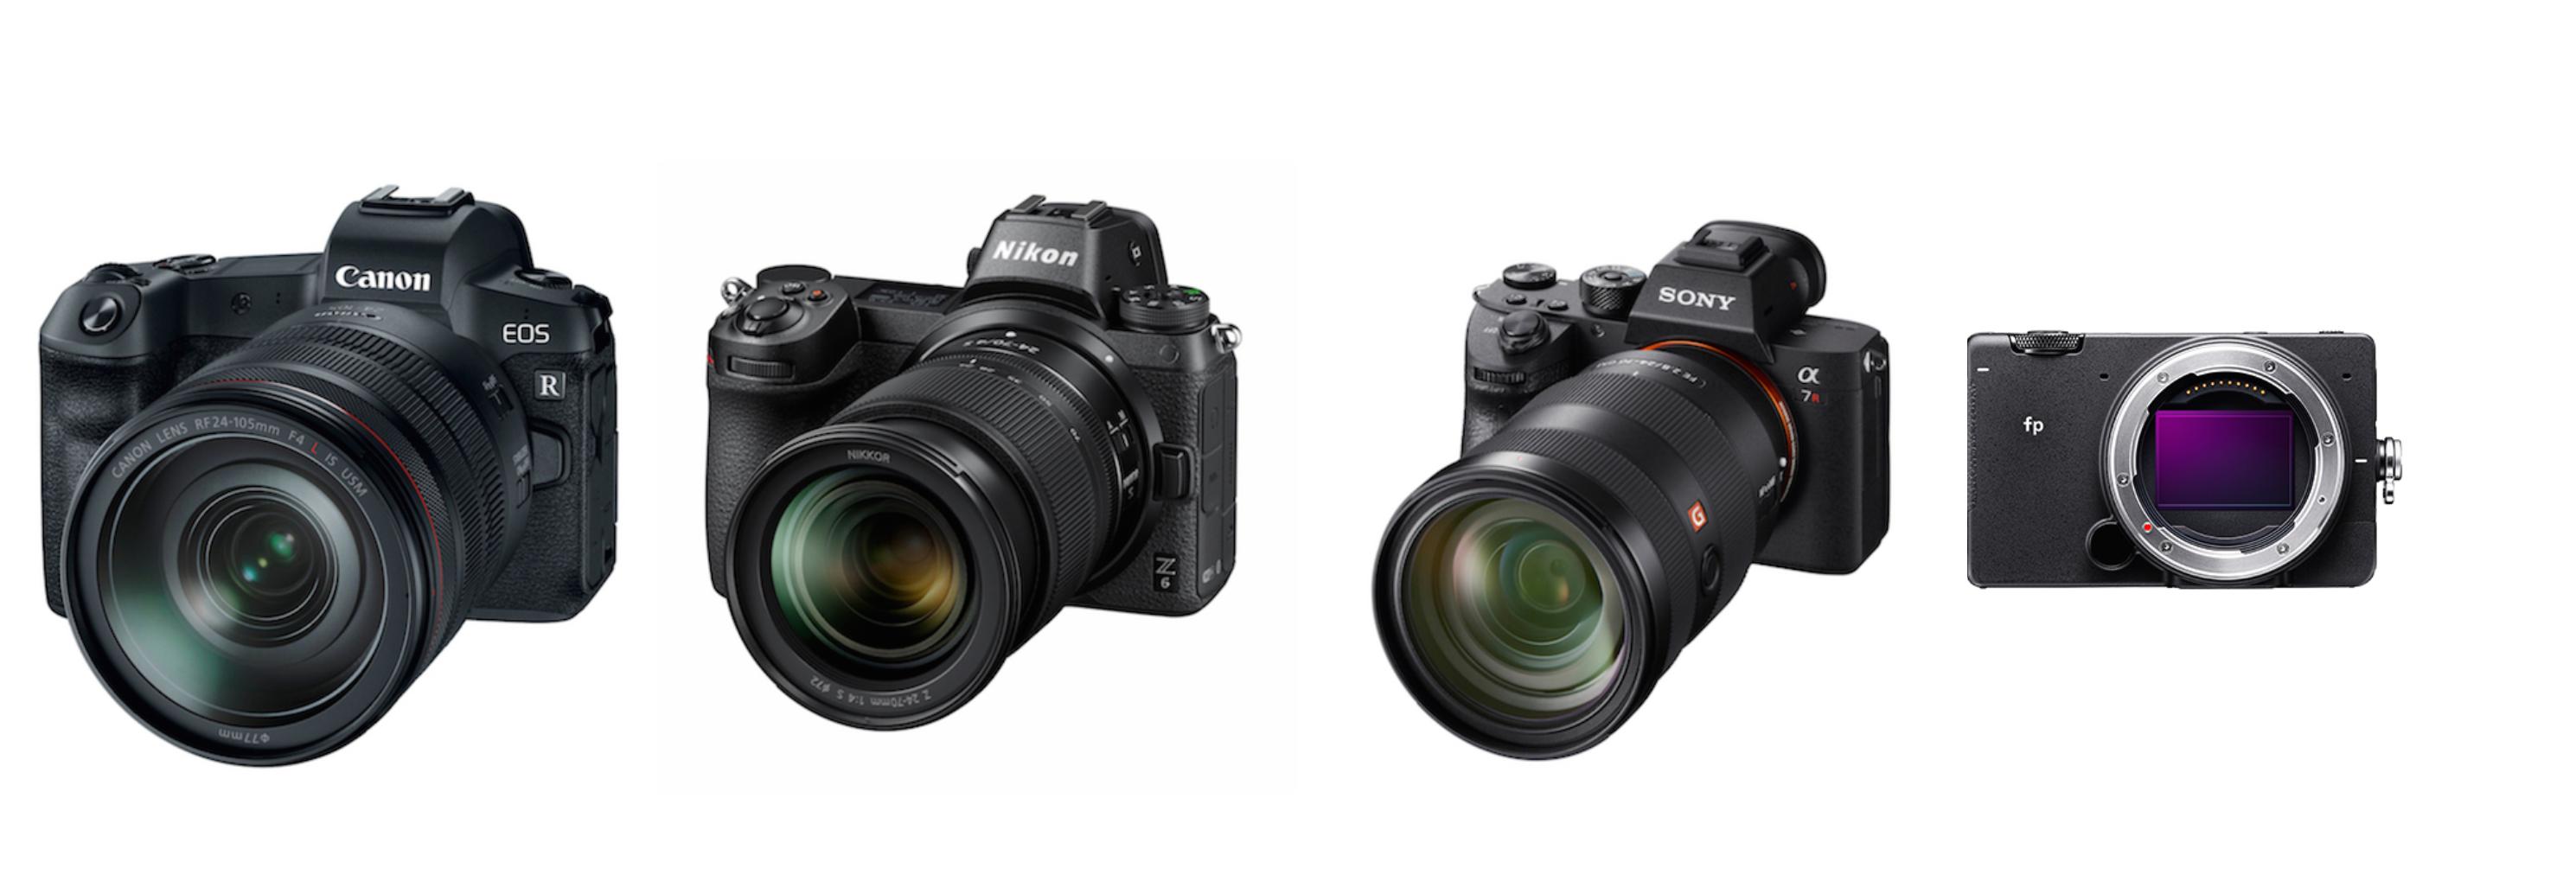 Nikon Z7 vs  Sony a7R III vs  Canon EOS R vs  Sigma fp